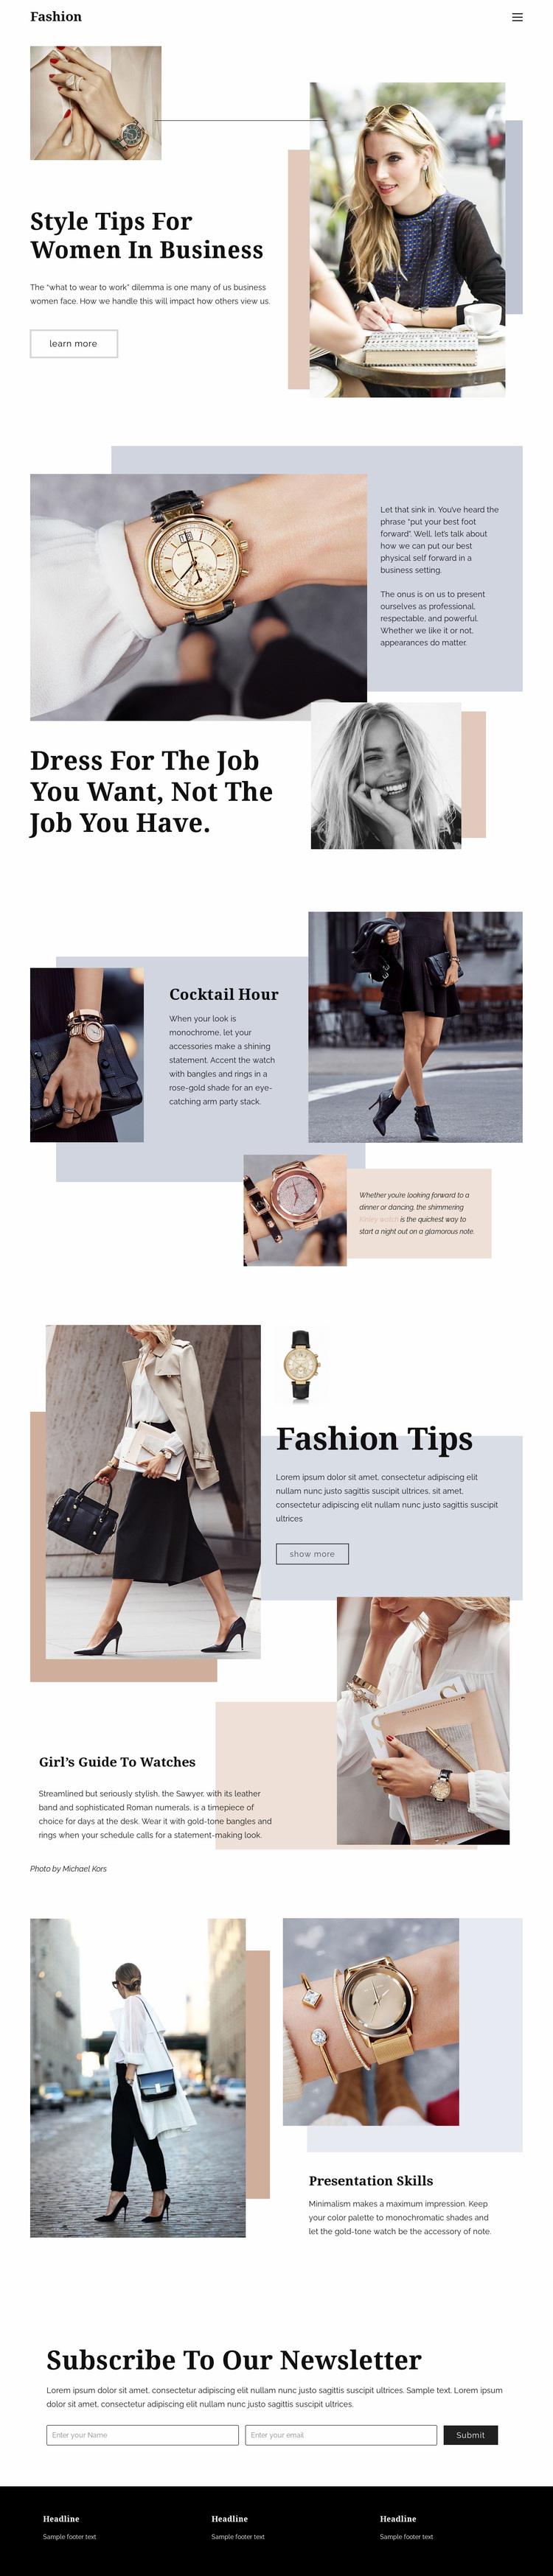 Fashion tips Website Design